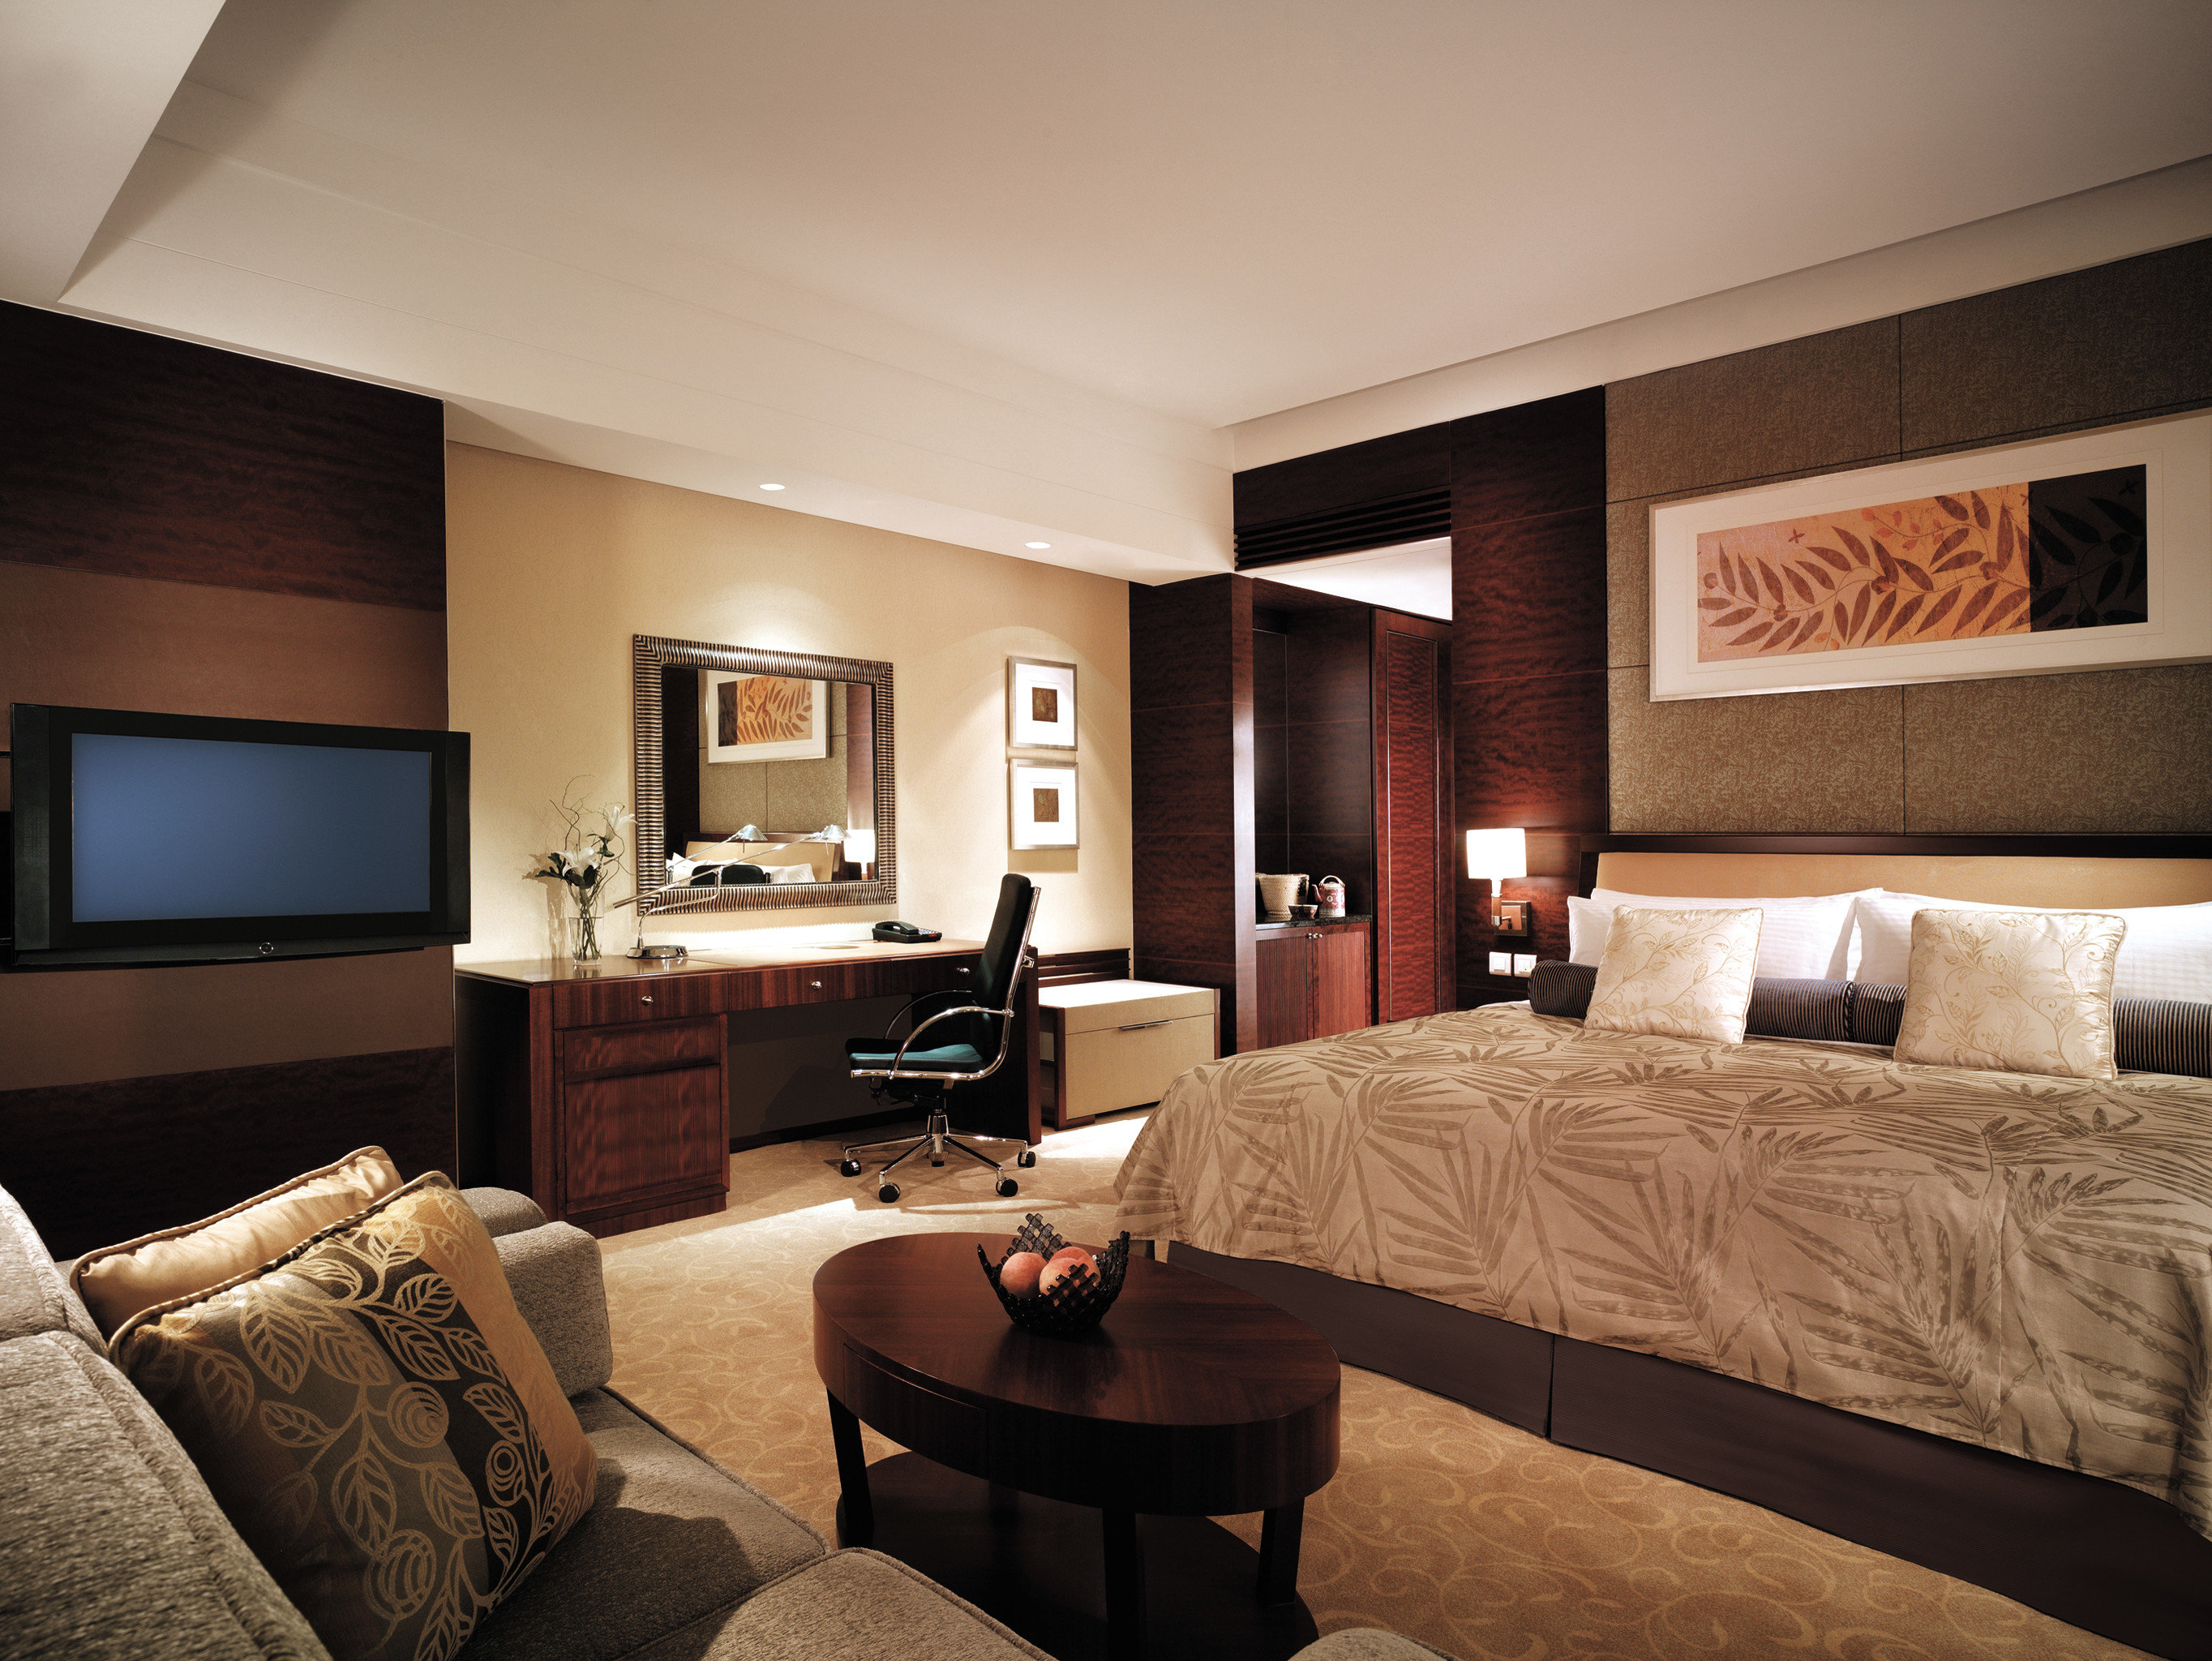 Bedroom City Elegant Hip Luxury Modern Scenic views Suite sofa property living room home condominium flat